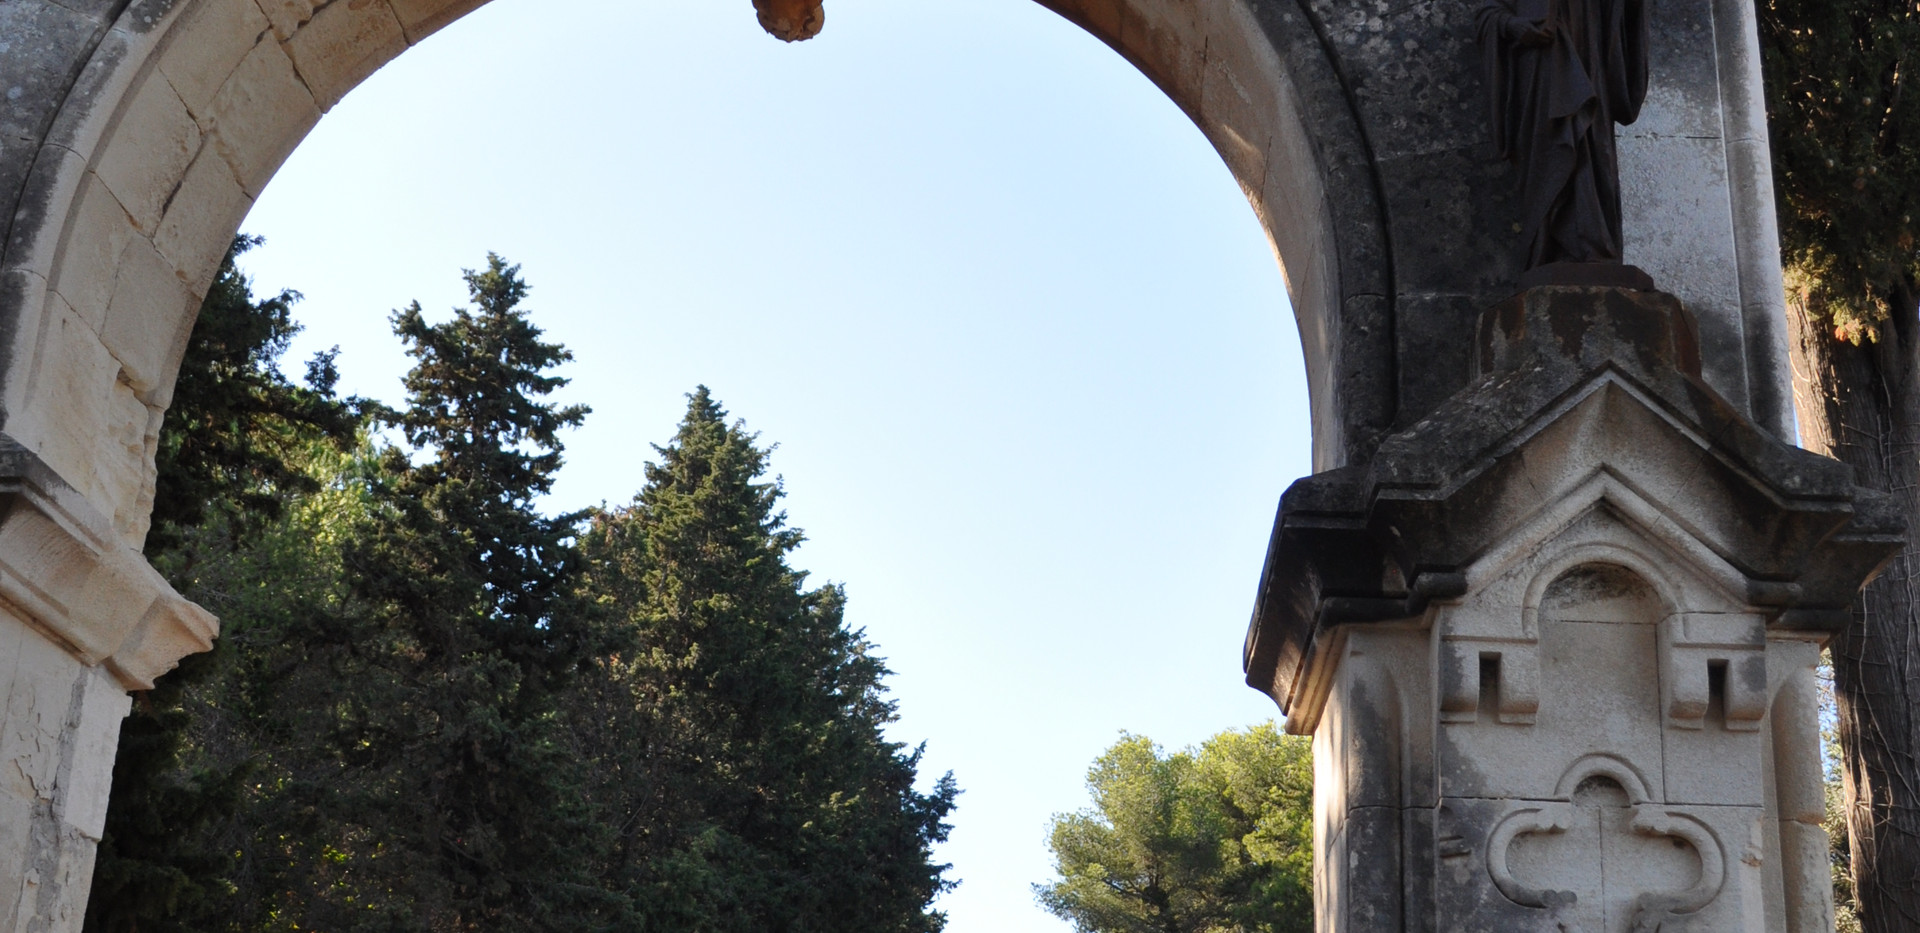 Klosterport på øen Saint-Honorat